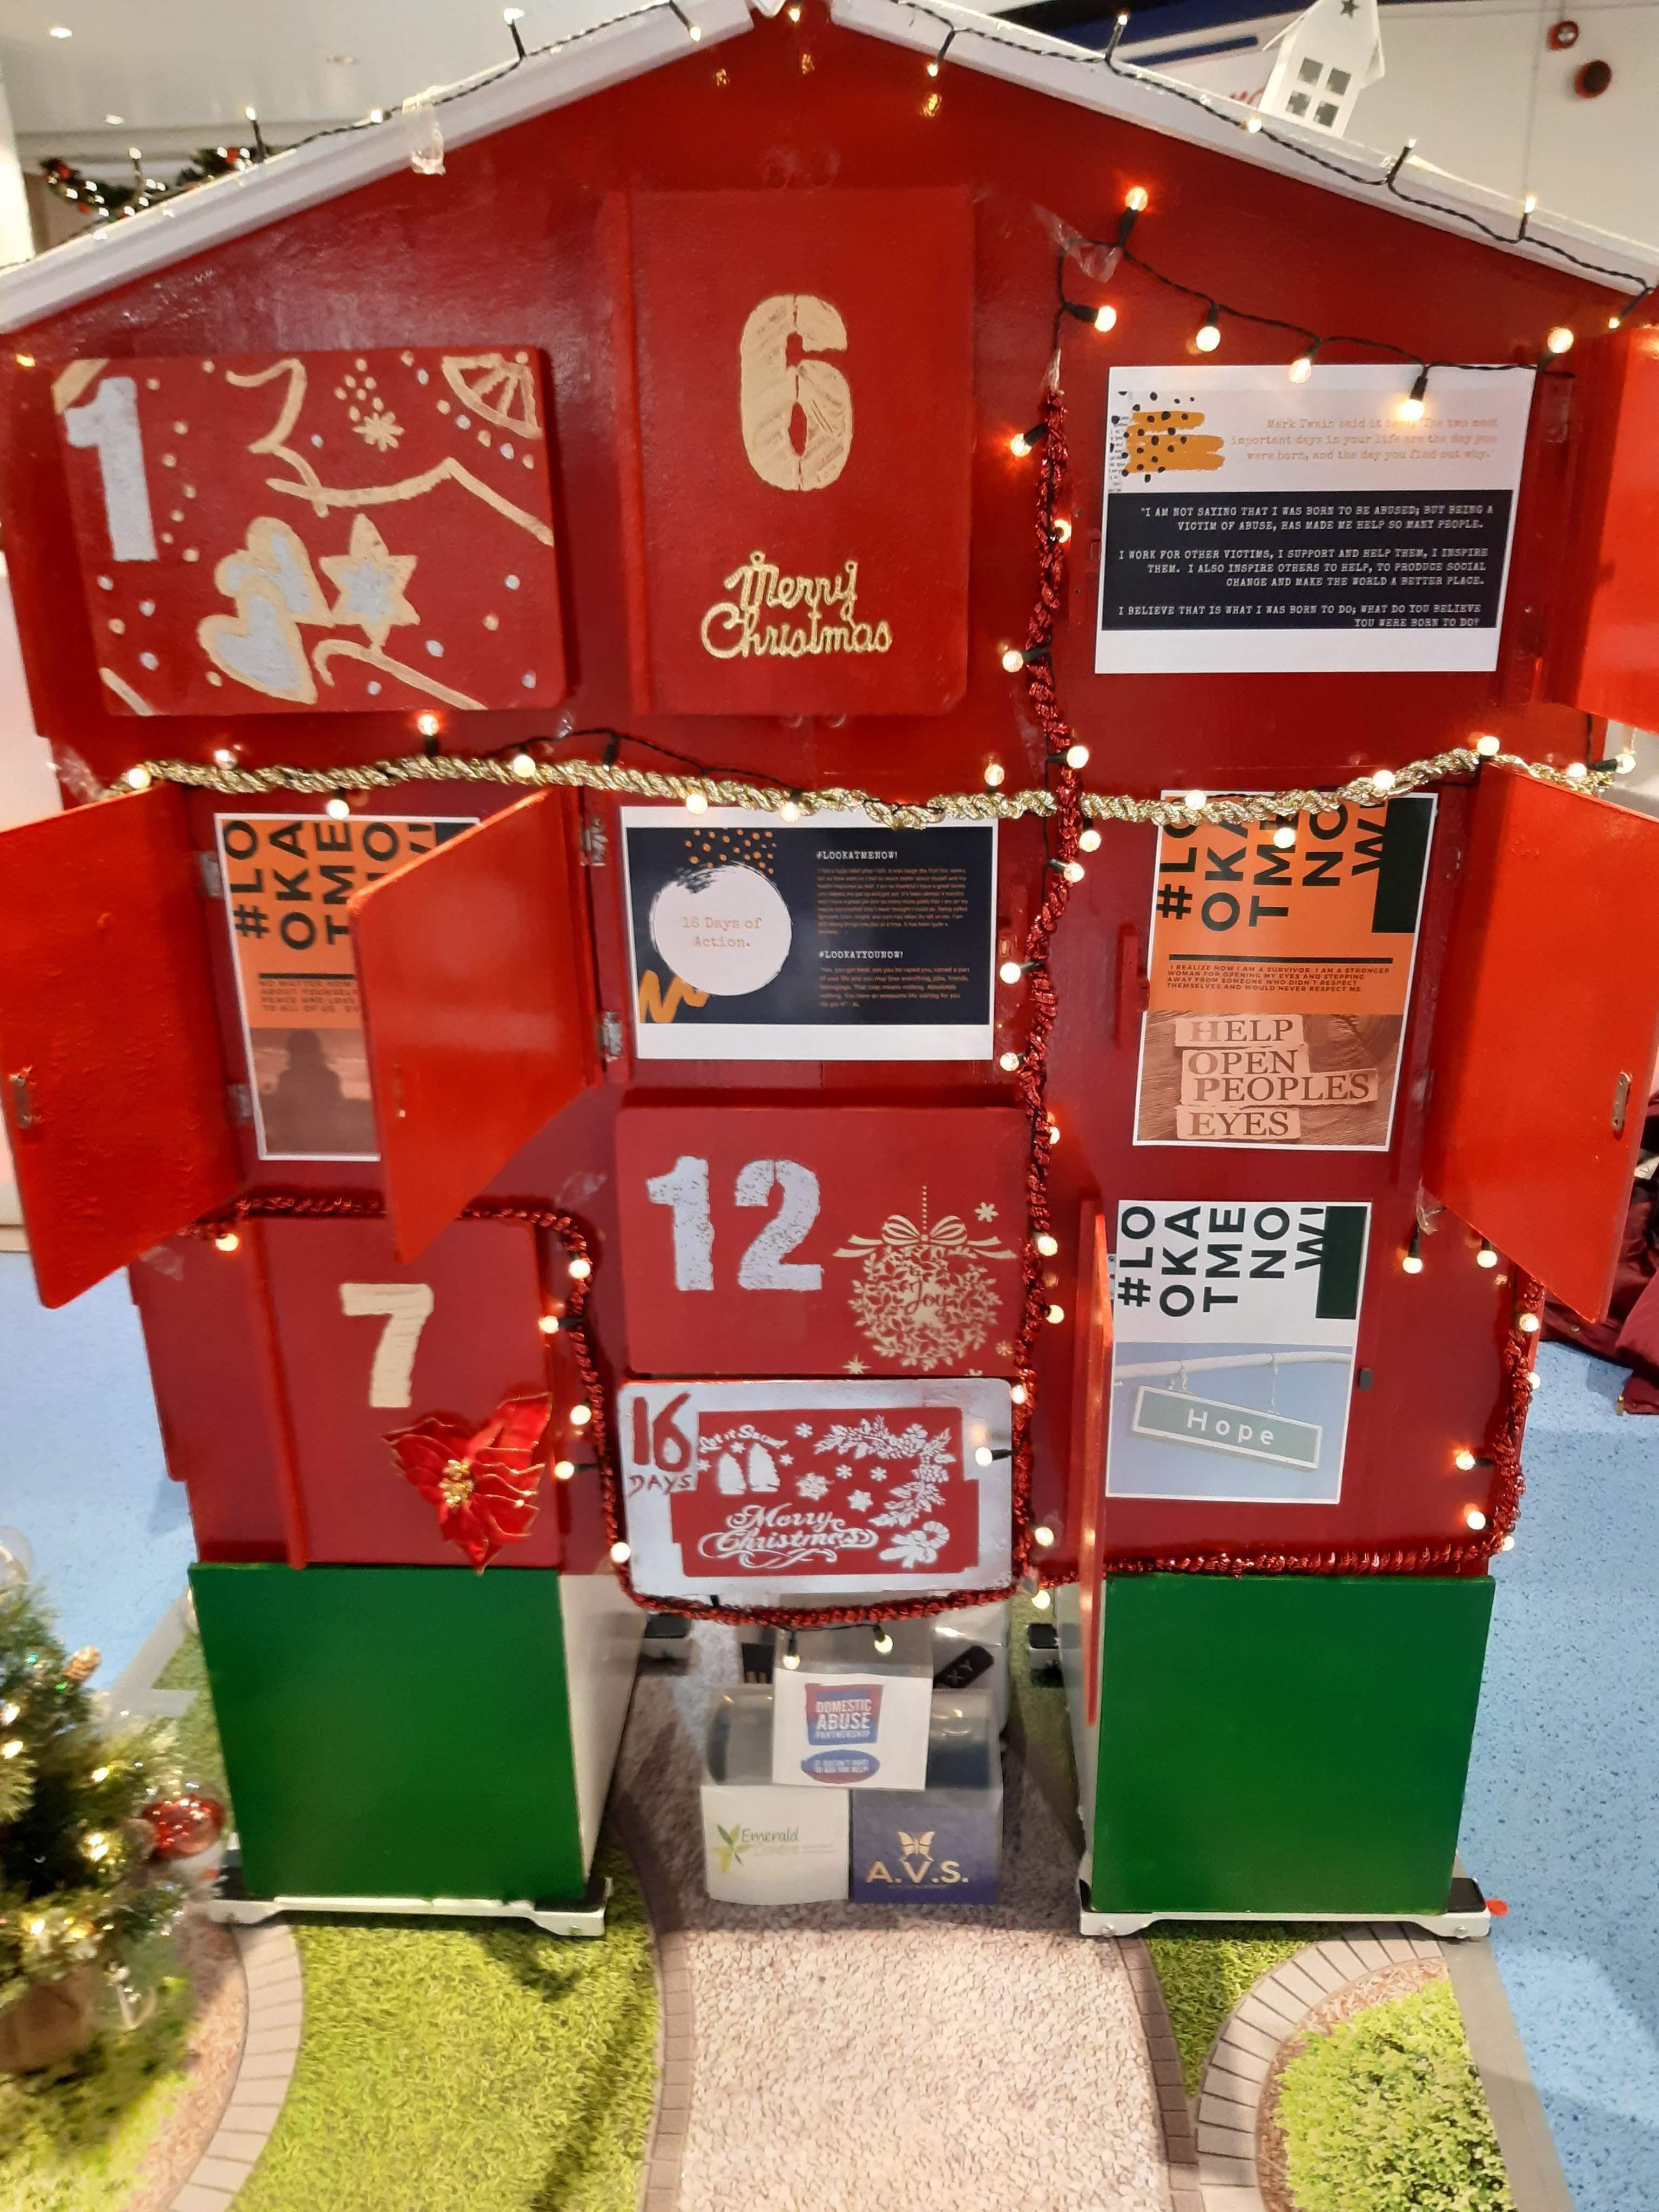 An image of the 3D Advent Calendar House, with garden floor matt, christmas tree and mailbox.